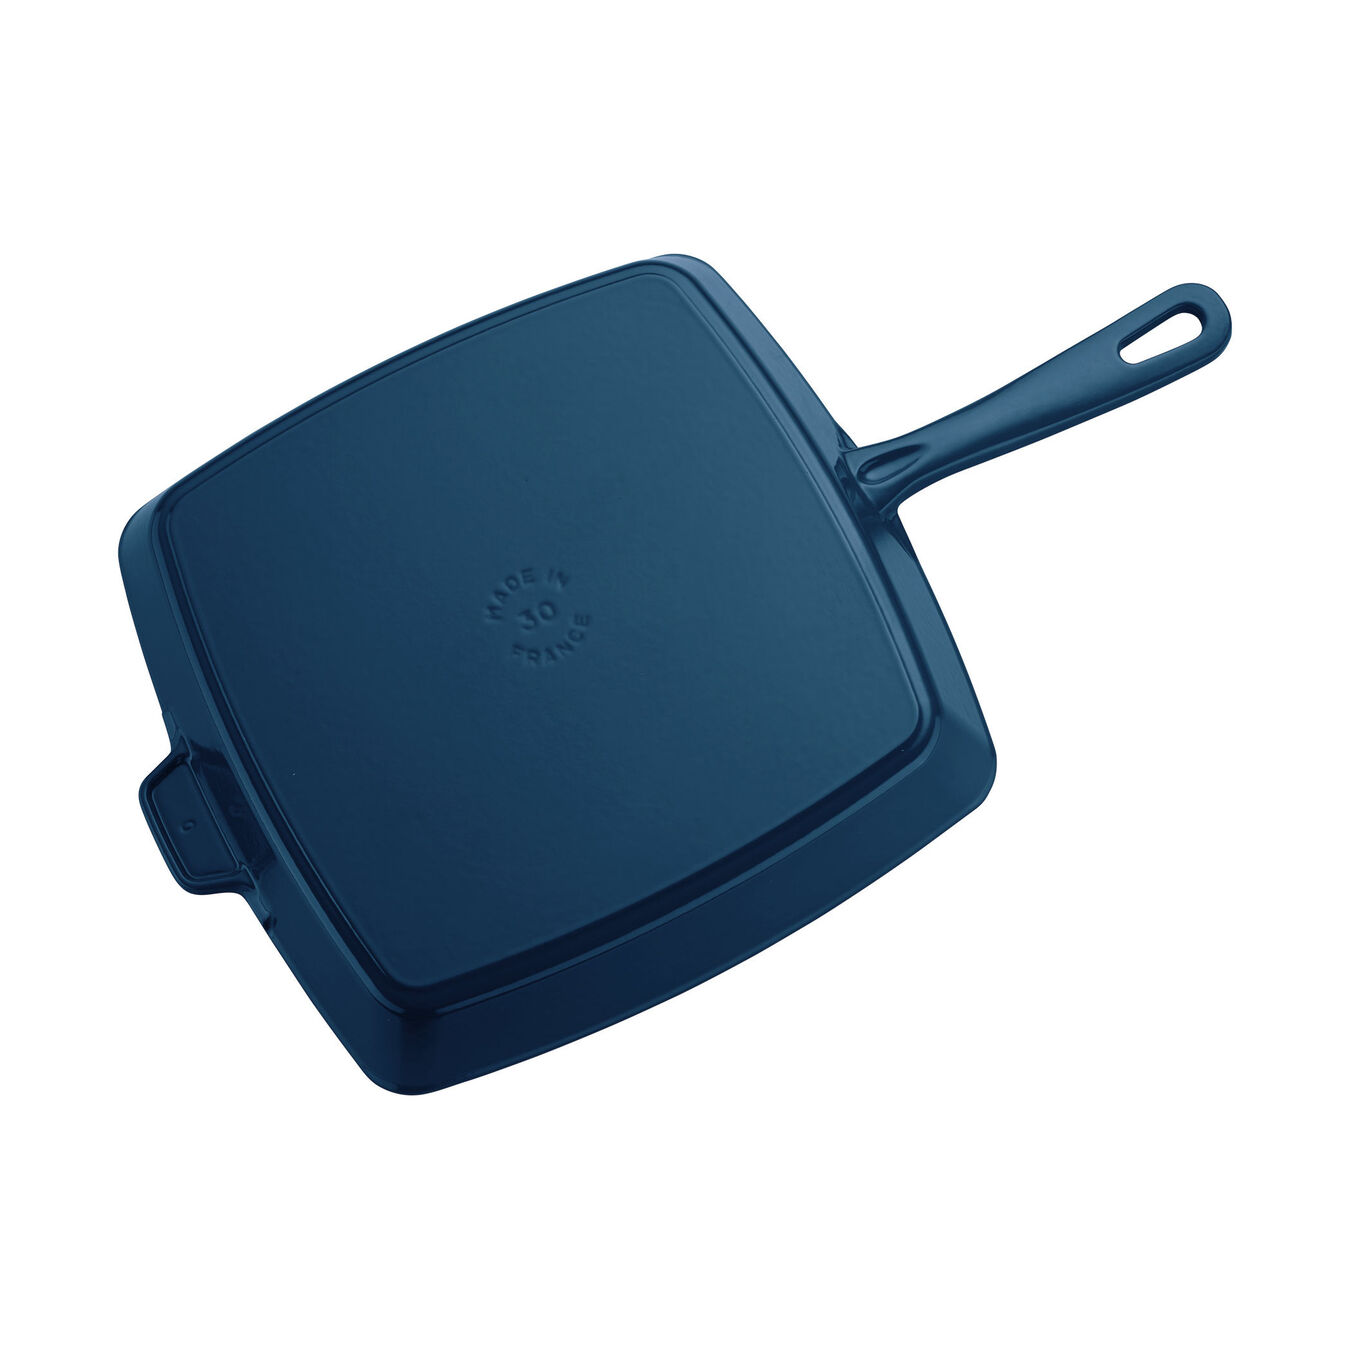 square, Grill set, Dark Blue,,large 4